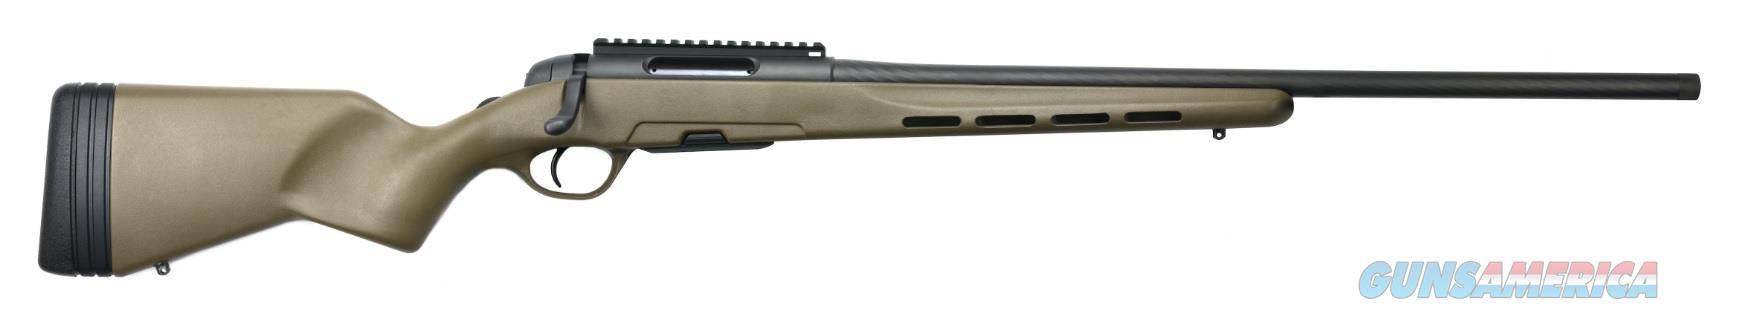 Steyr Pro Hunter (56.323G.3G)  Guns > Rifles > Steyr Rifles